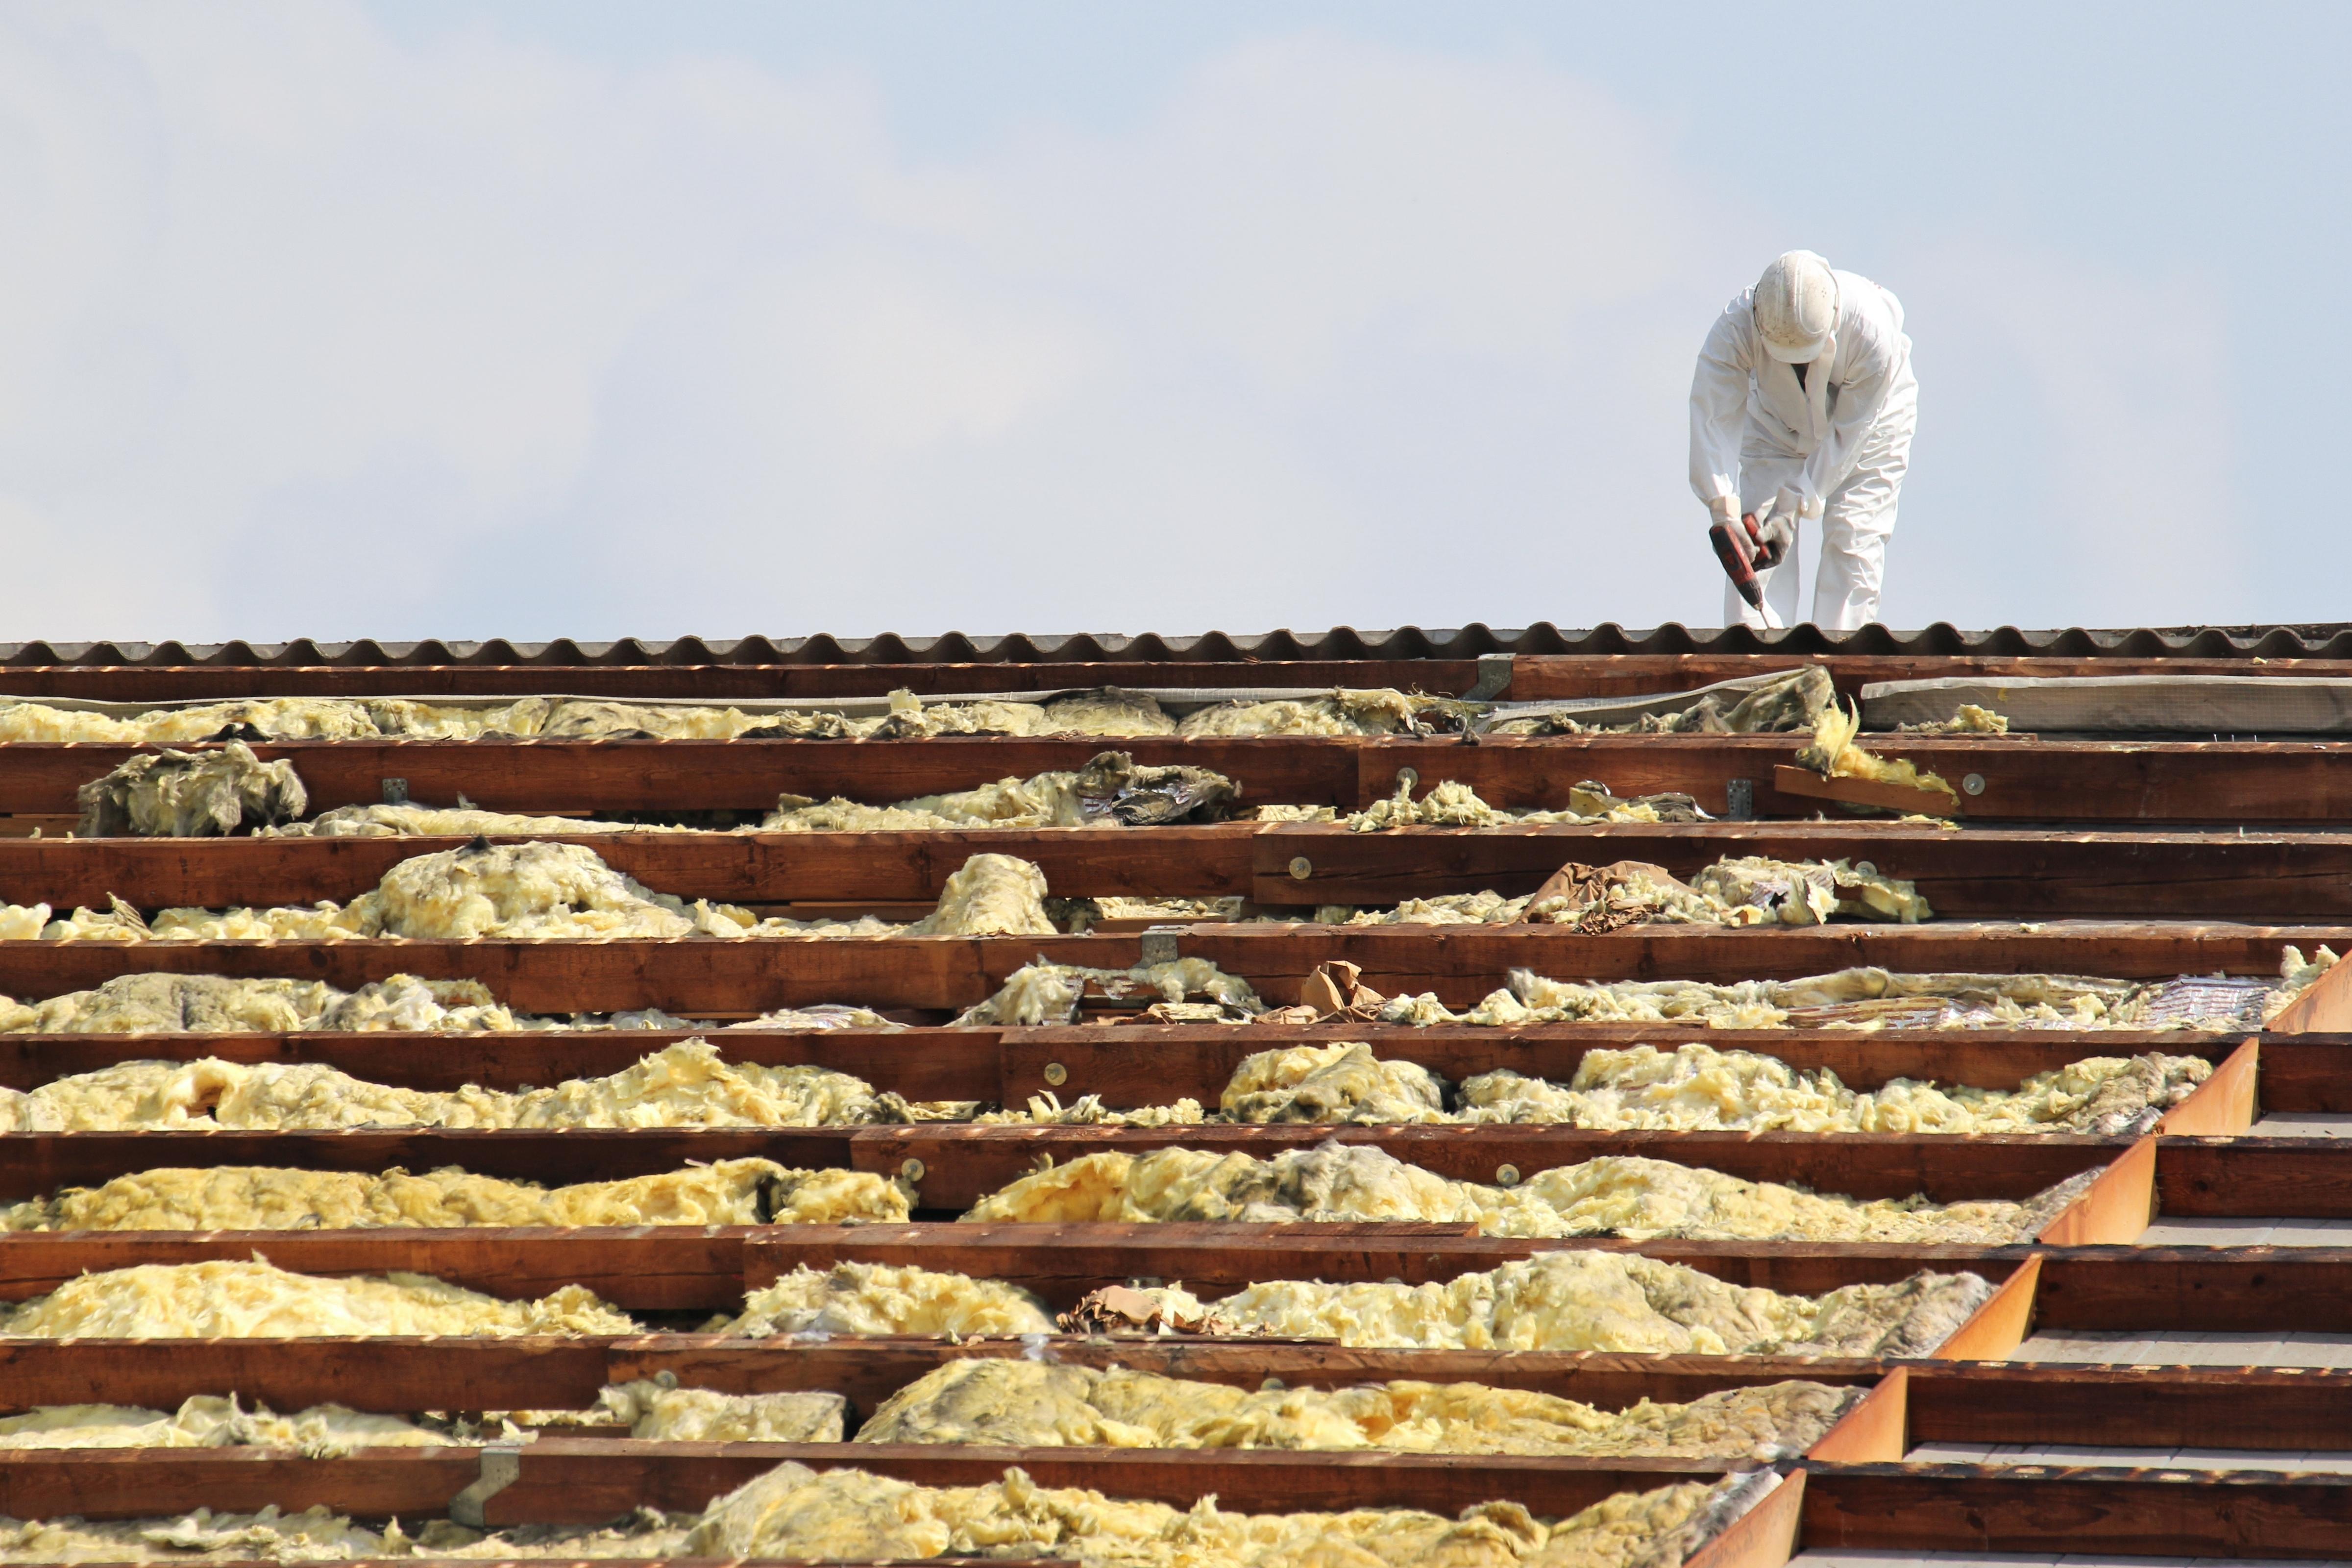 NW Hazmat safely removes asbestos